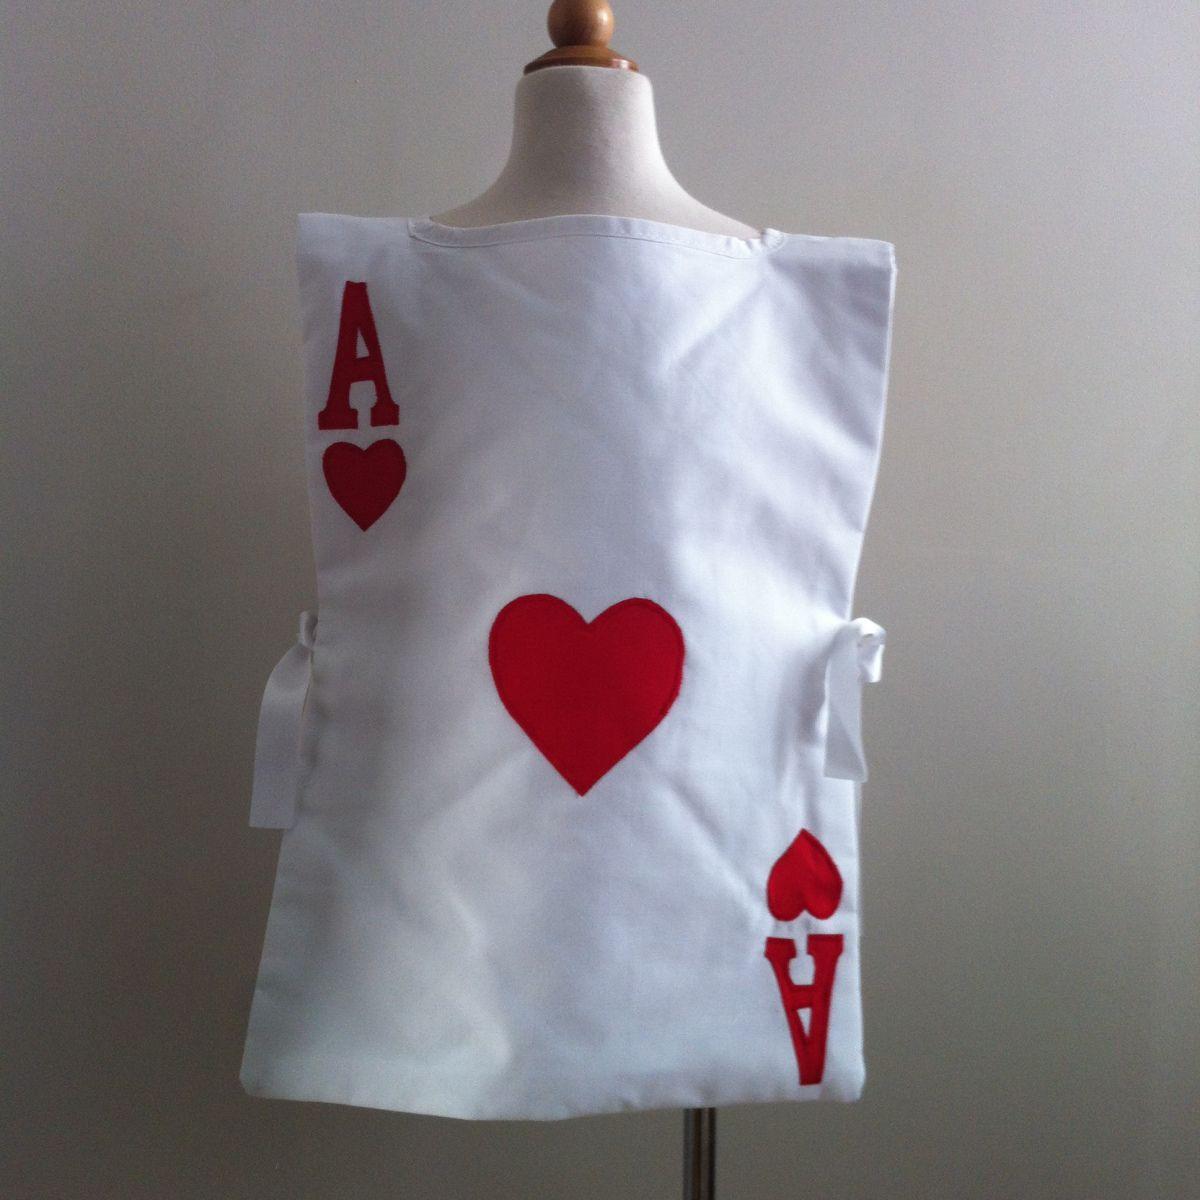 Cards Alice In Wonderland Costume Google Search Alice In Wonderland Diy Alice In Wonderland Costume Alice In Wonderland Fancy Dress